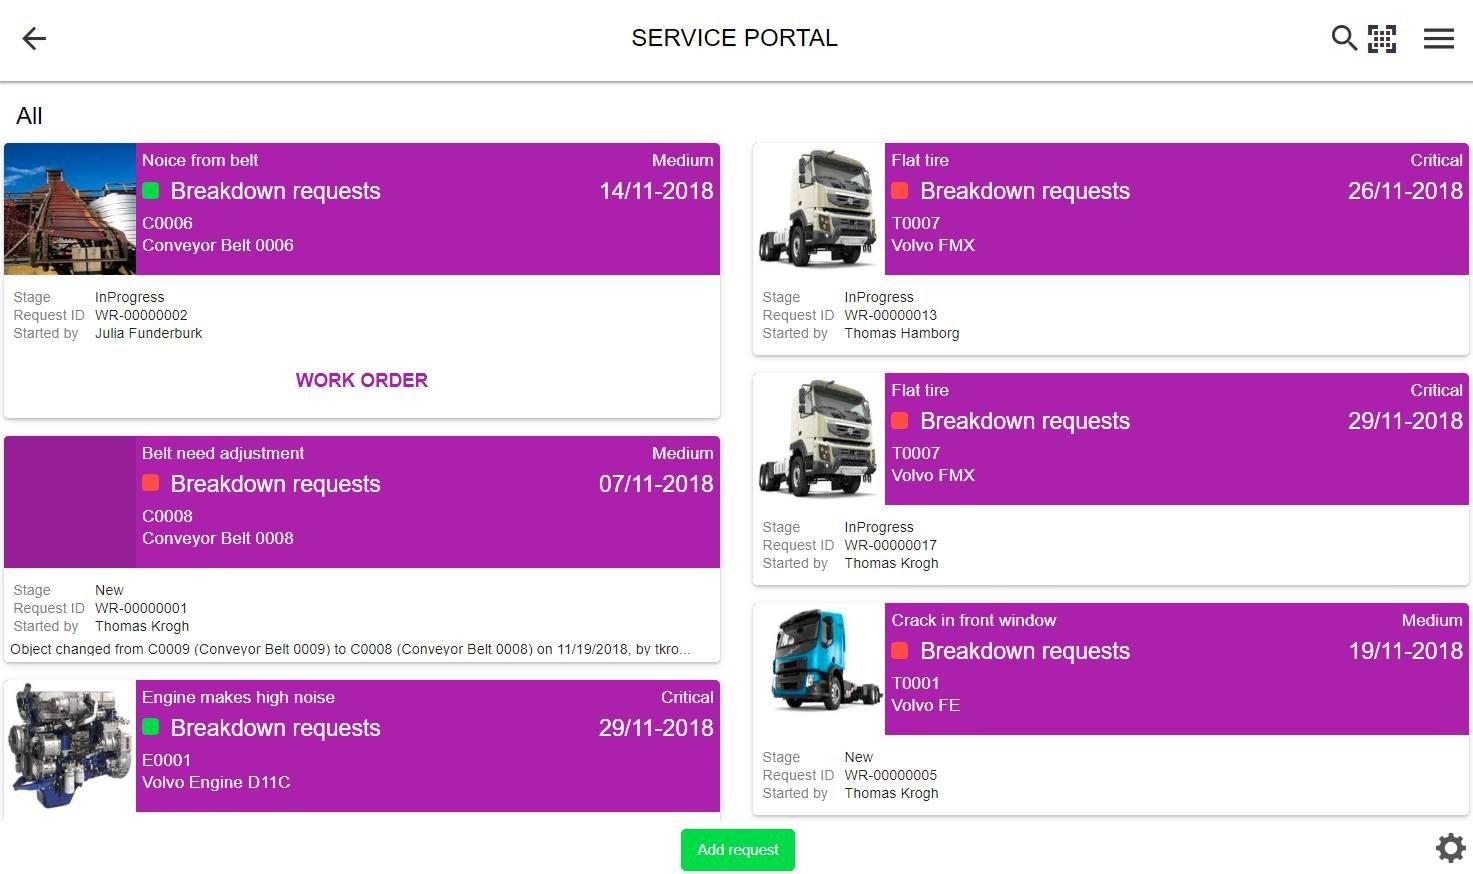 04-service-portal